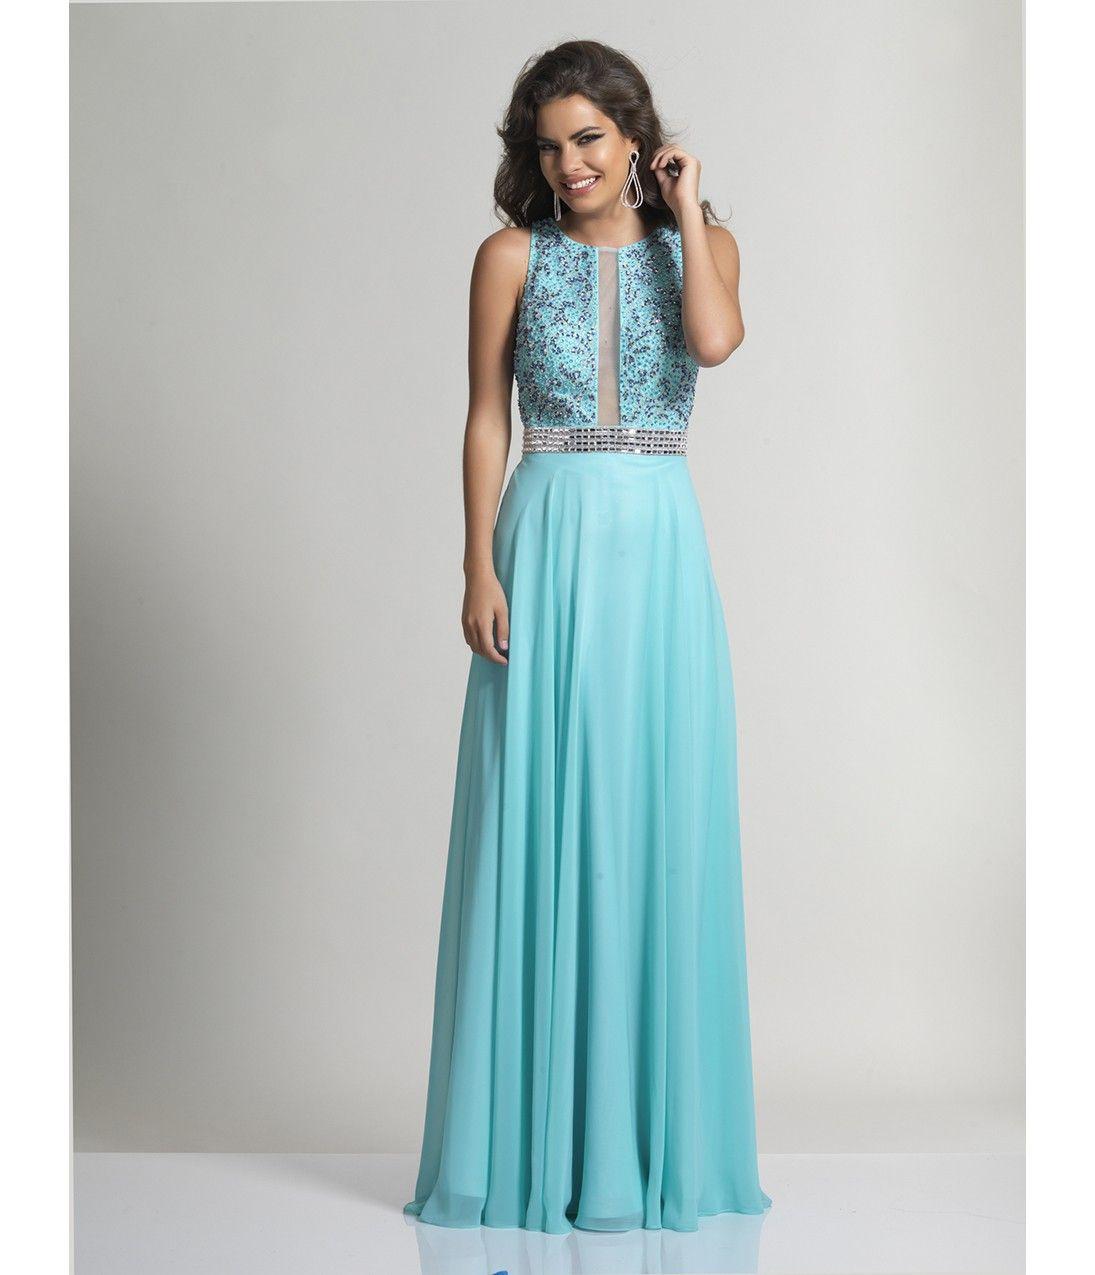 Aqua Blue Sleeveless Keyhole Chiffon Long Dress | Beauty in Blue ...